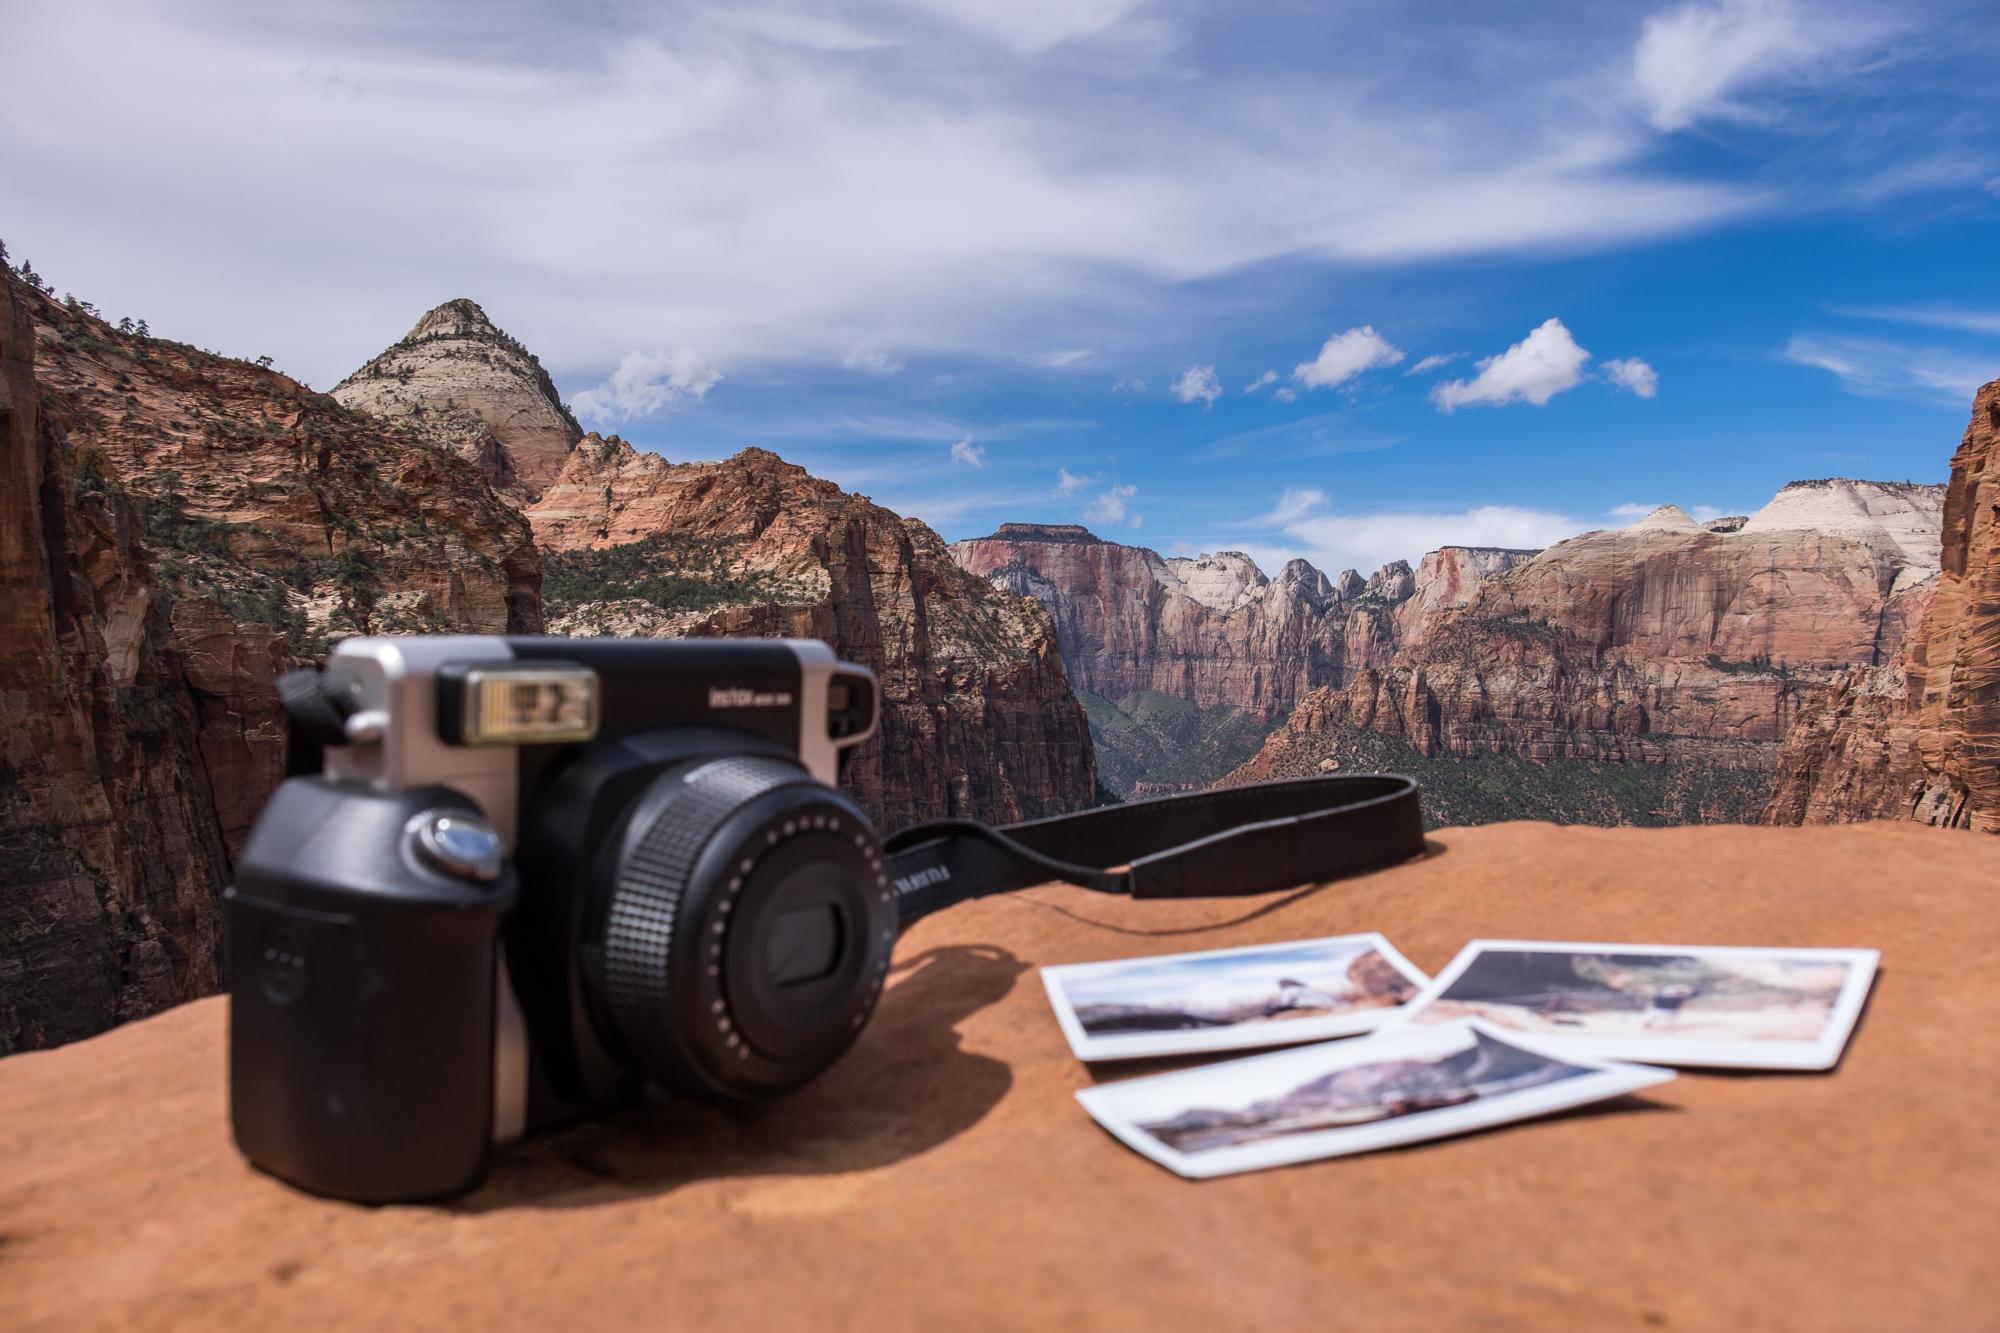 Fujifilm Instax-ing in Zion National Park in southern Utah.